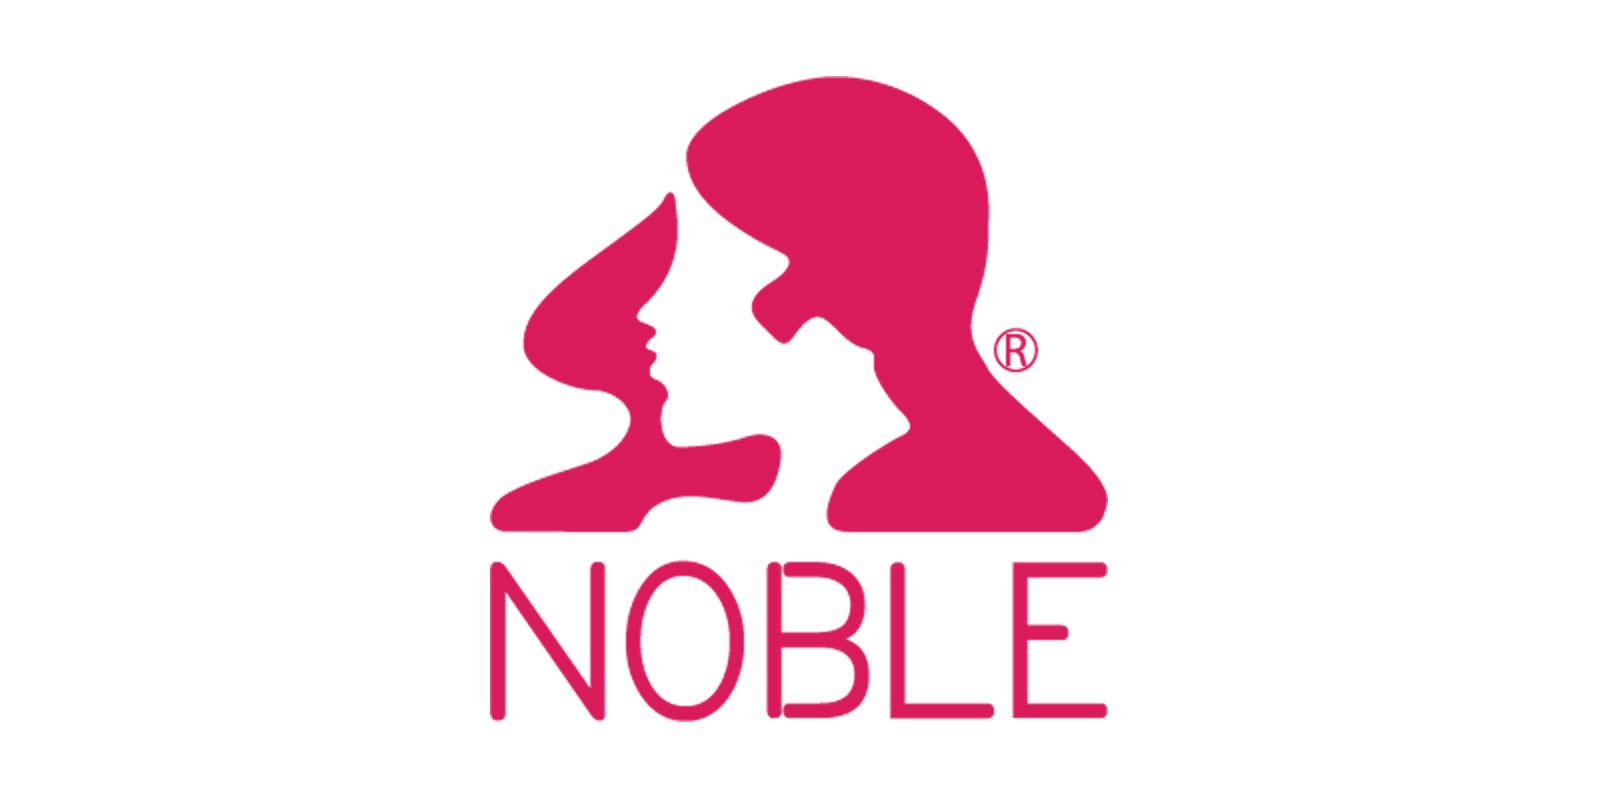 Gamme Noble de la marque Sleek hair